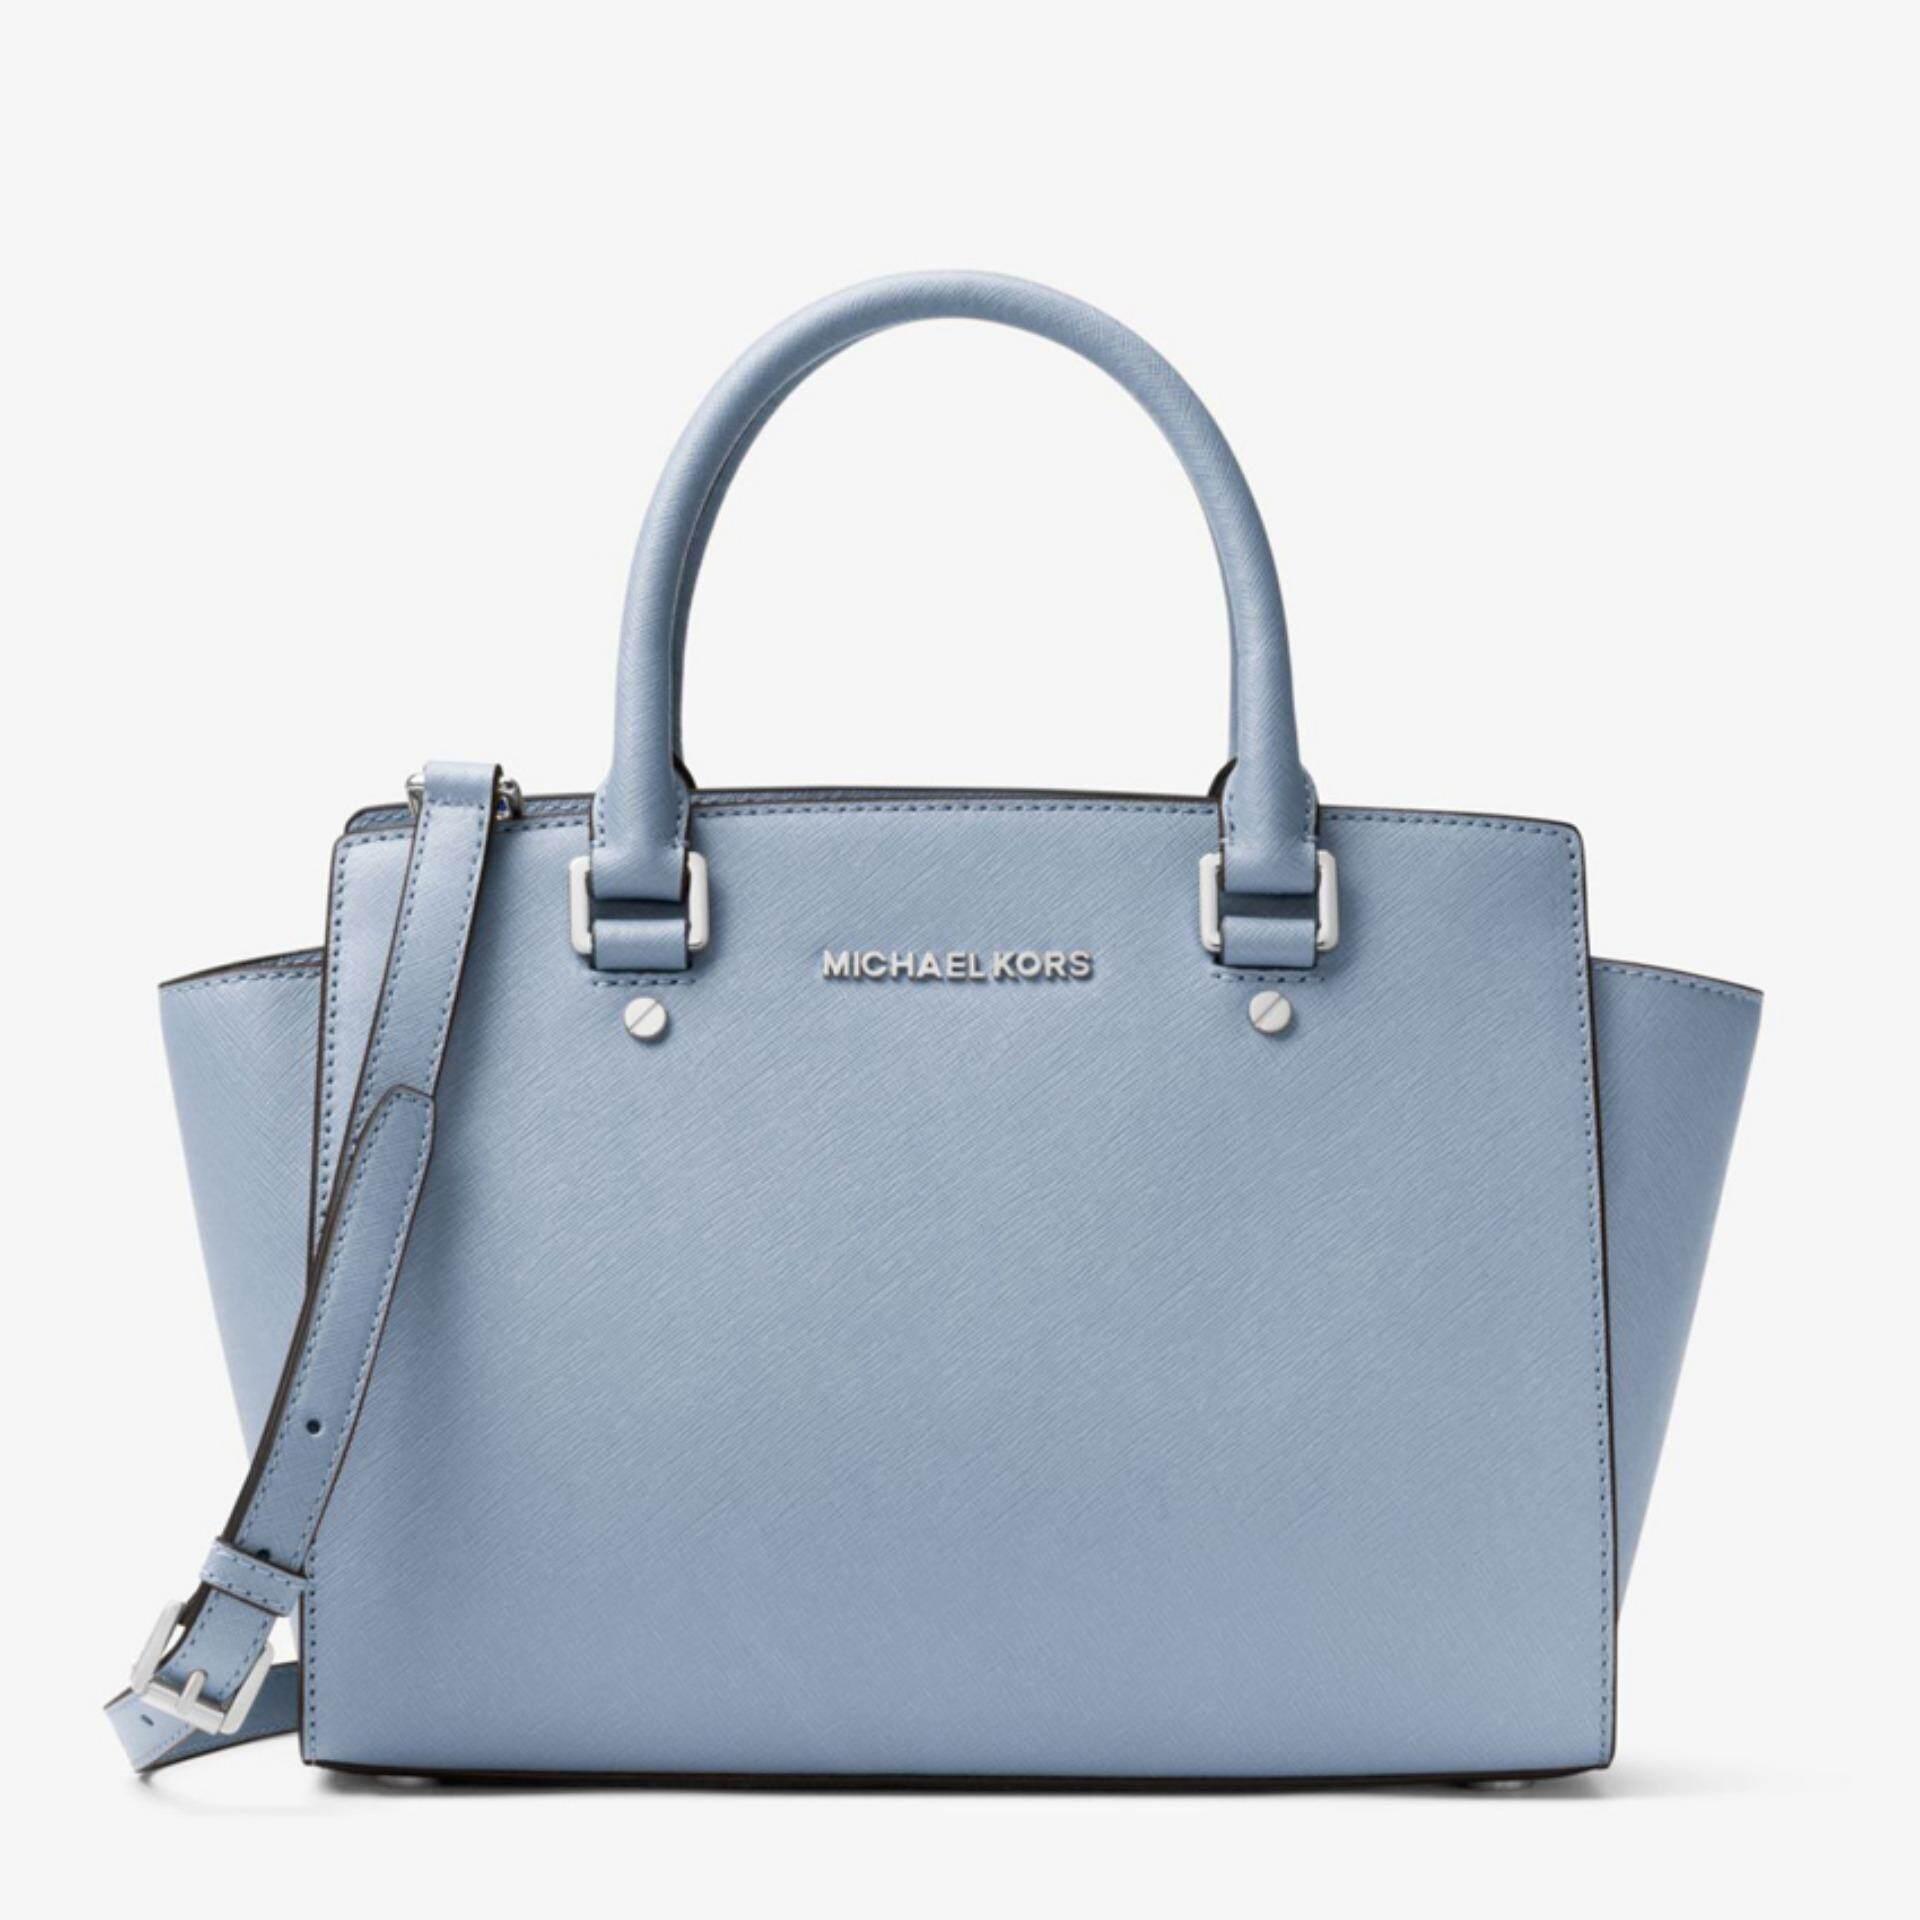 24ca3ddec9 Michael Kors Selma Medium Saffiano Leather Satchel - Pale Blue